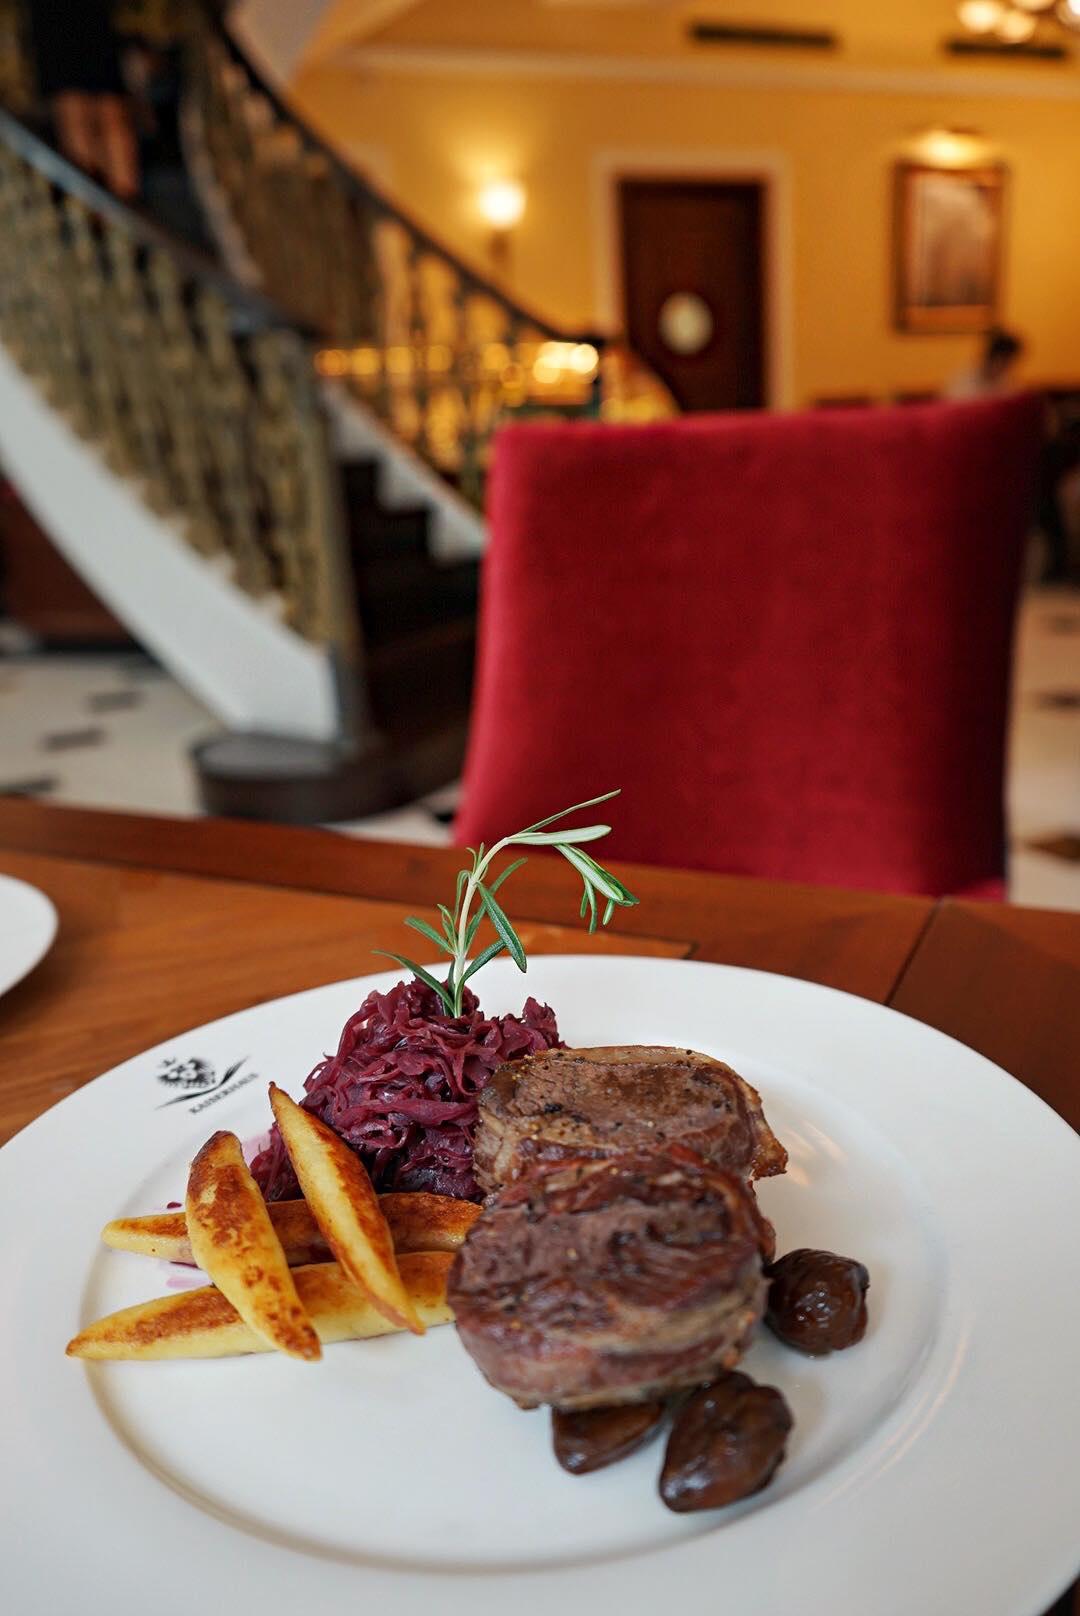 kaiserhaus-steak-with-bacon-aspirantsg